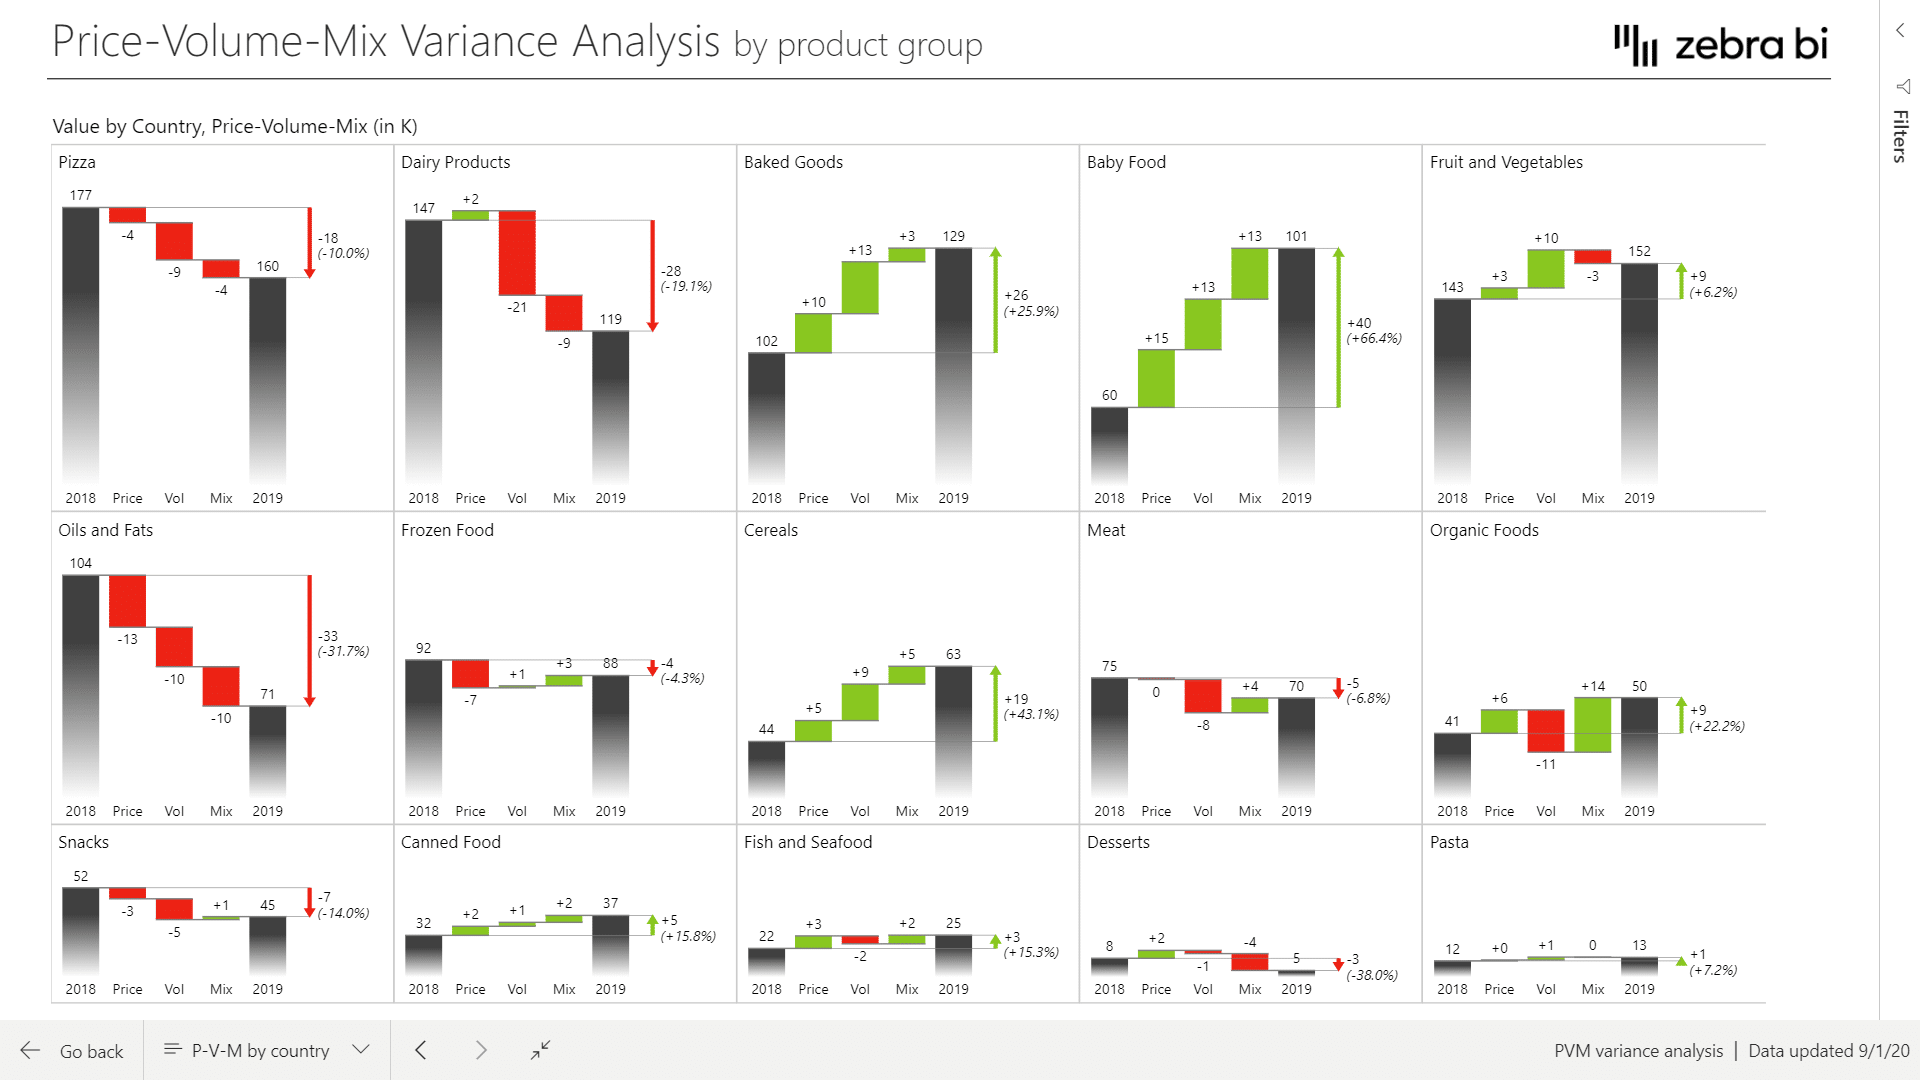 Price-Volume-Mix variance analysis